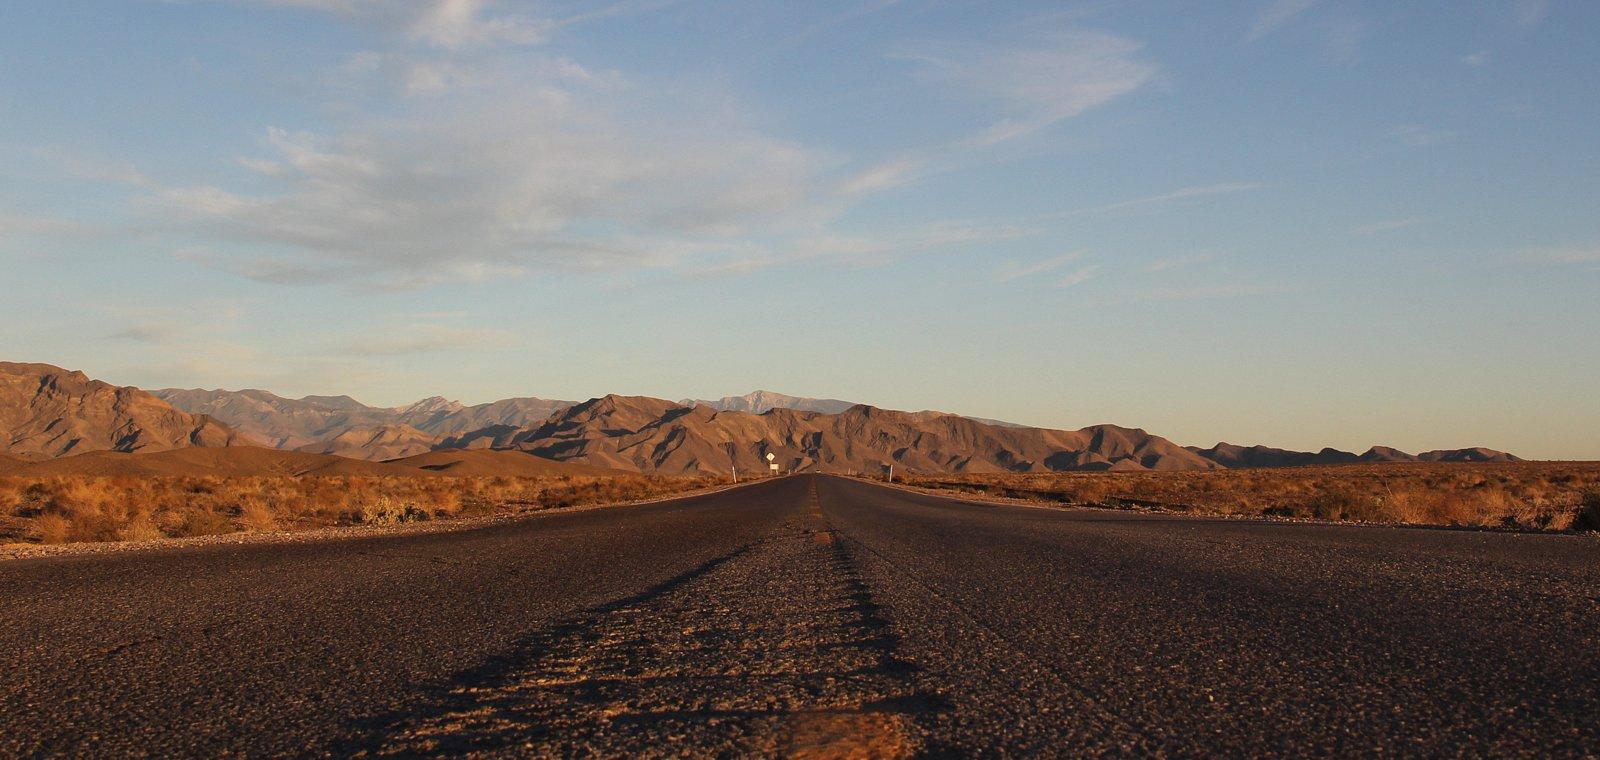 Dolina_Smierci_Death_Valley_Nevada_photo_photo_2441